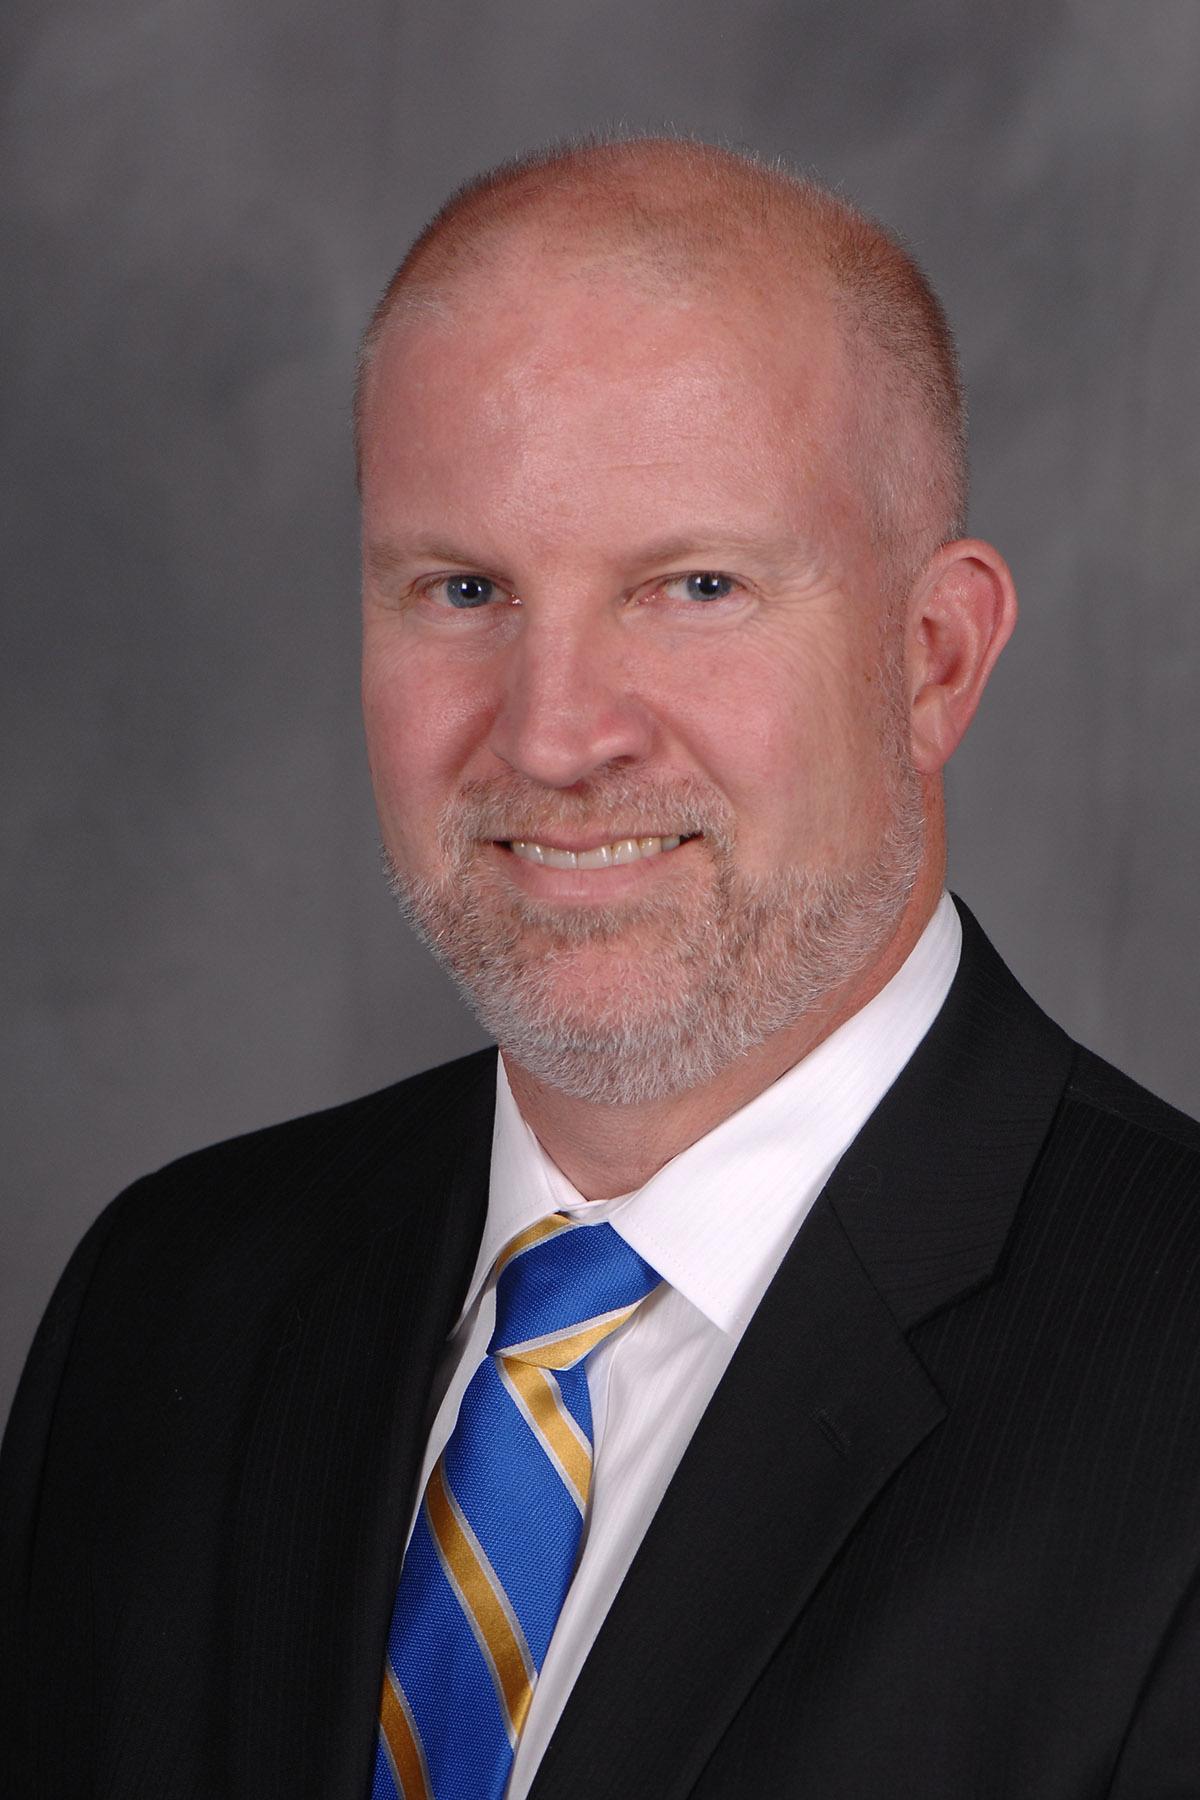 Douglas Delahanty, Associate Dean, Research and Sponsored Programs